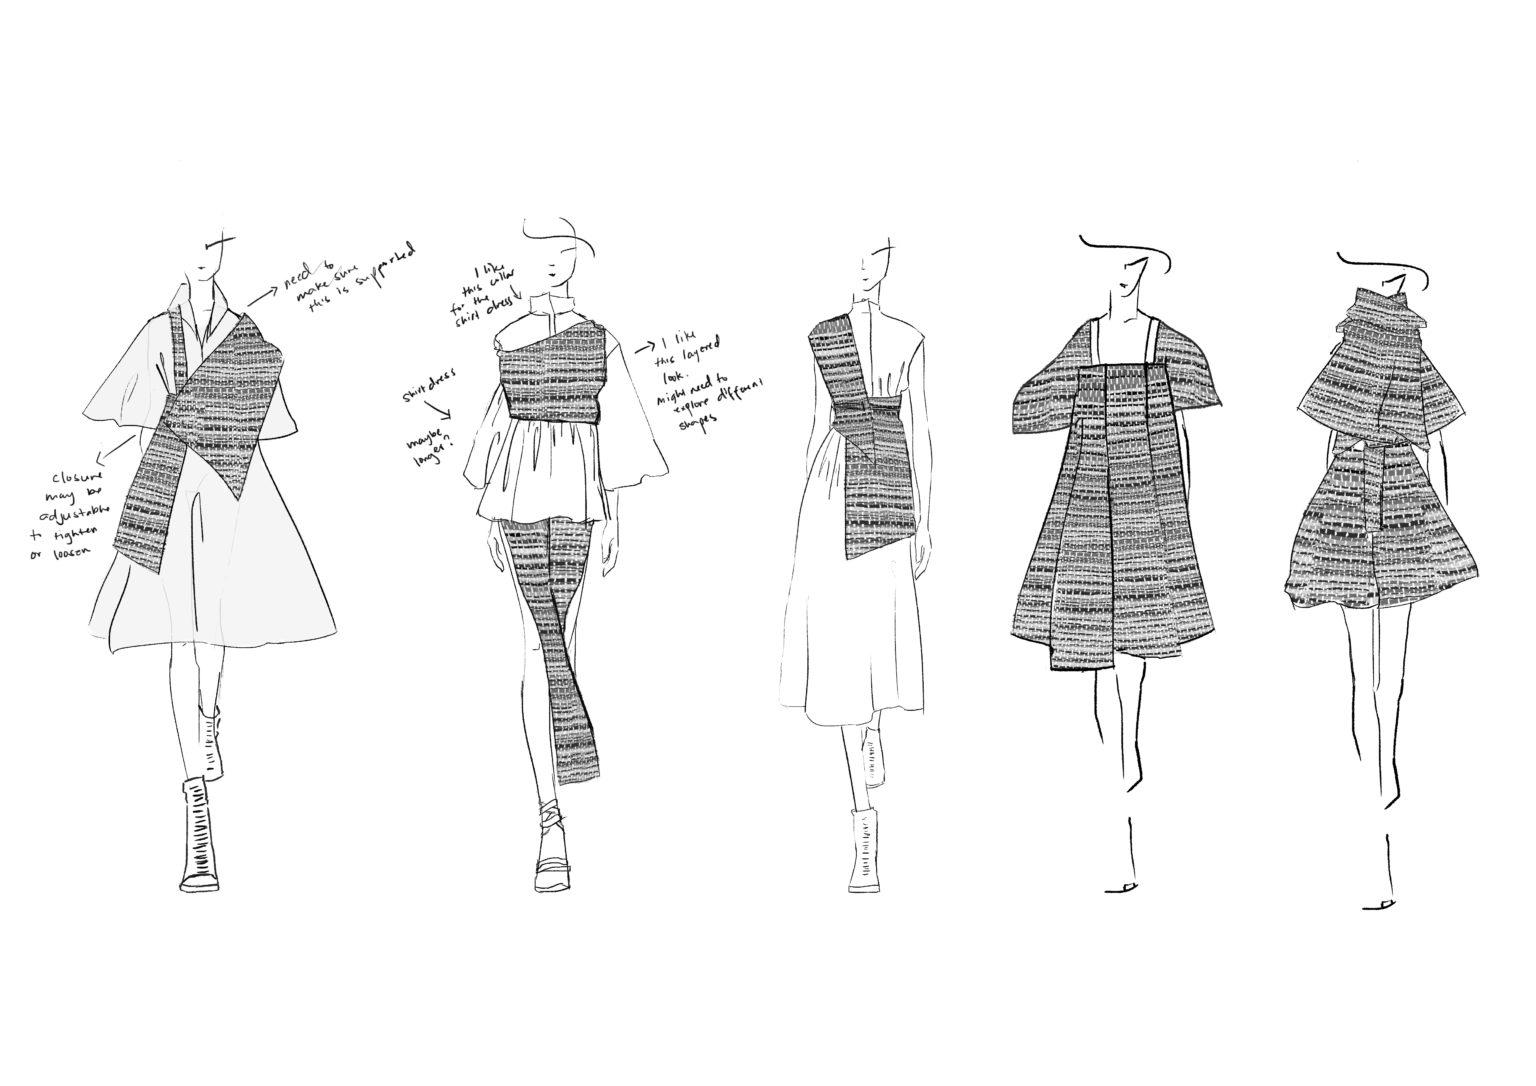 Draft 1. Designed for Tatsulok Collection